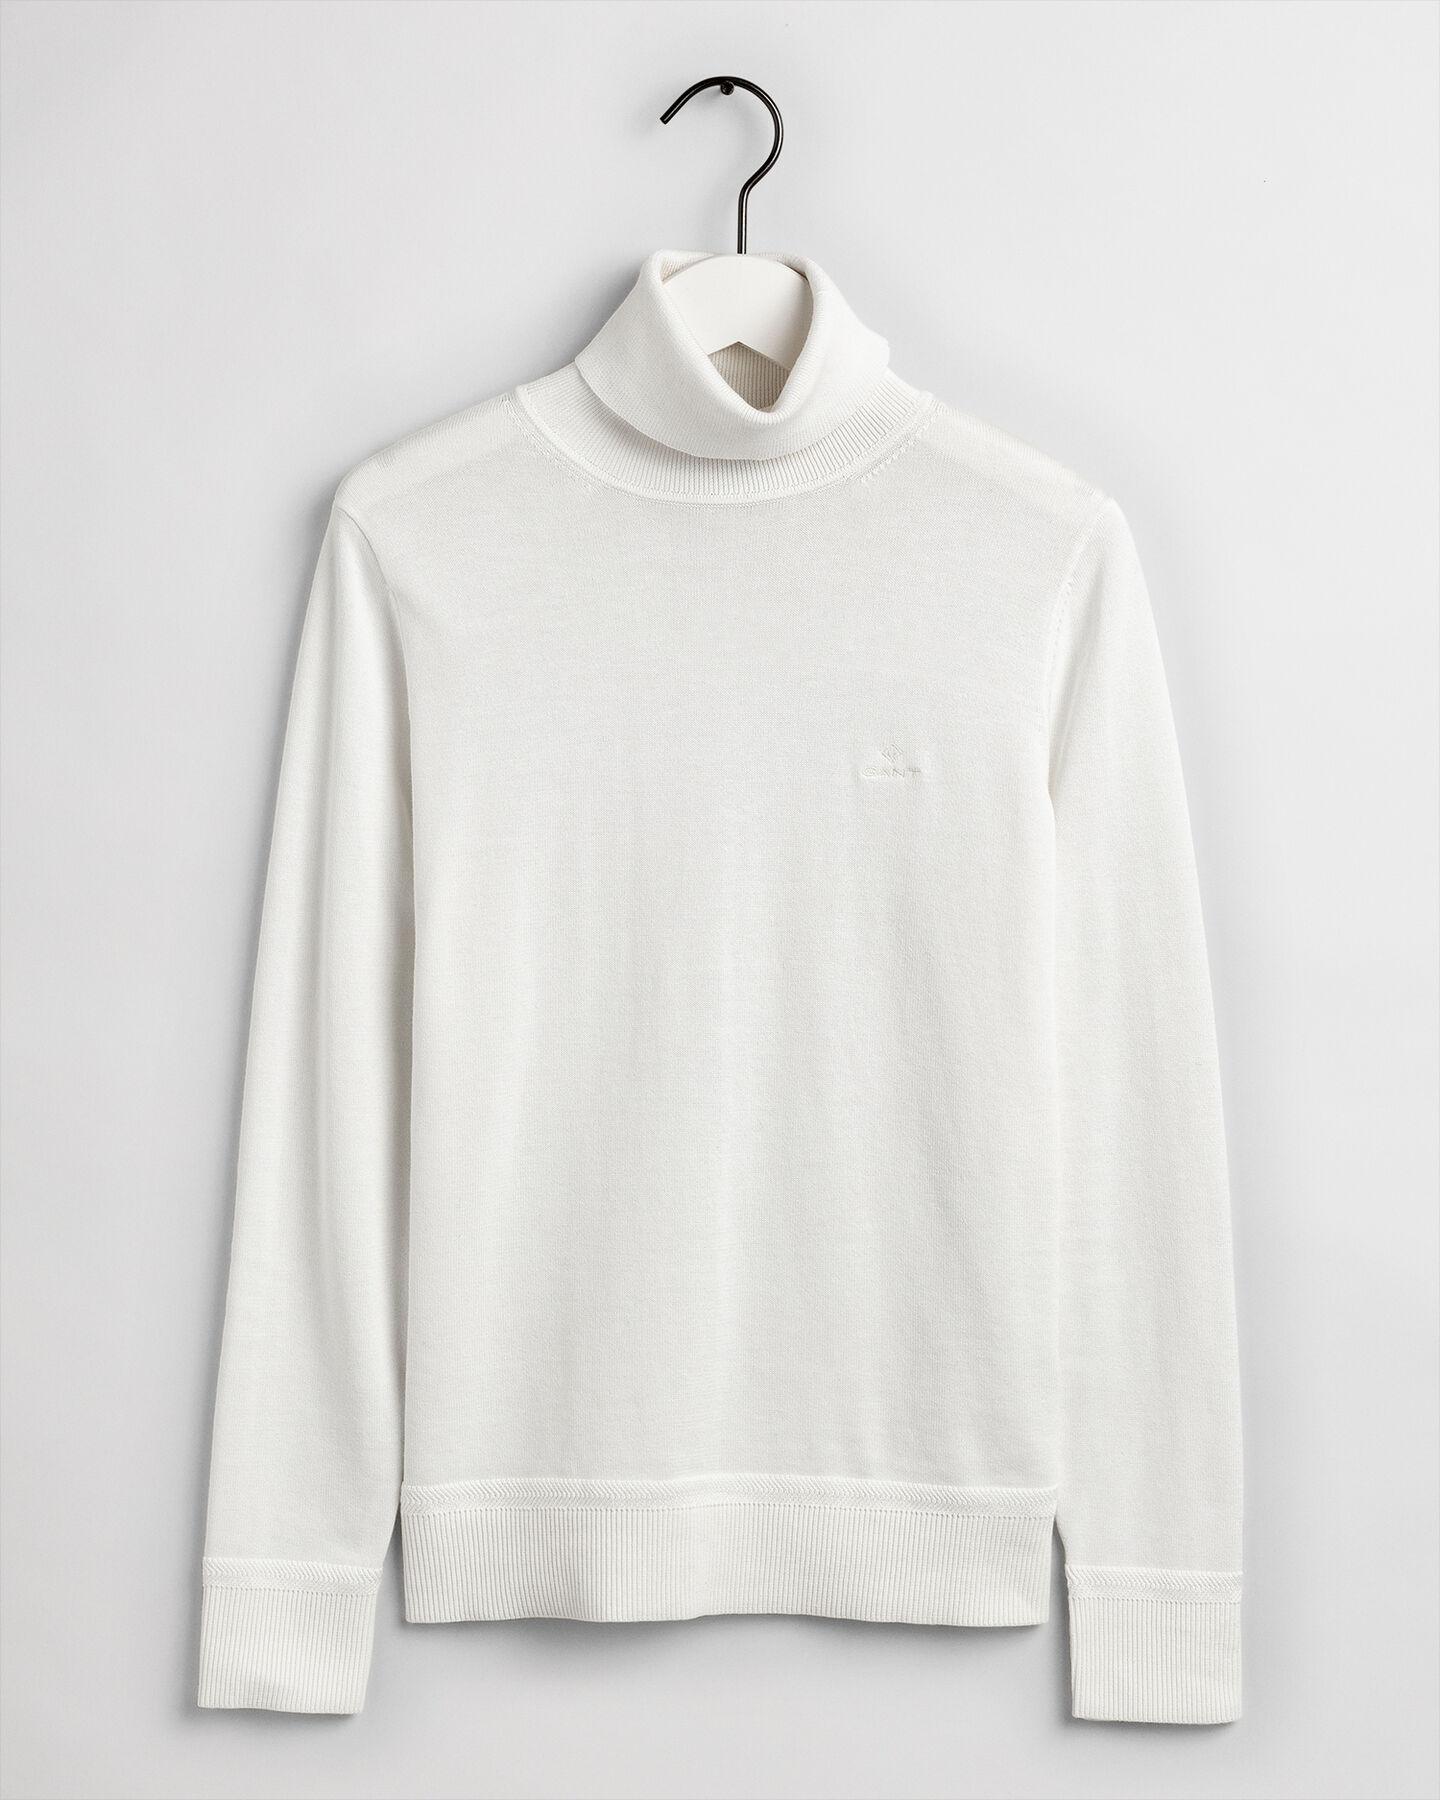 Light Cotton Turtleneck